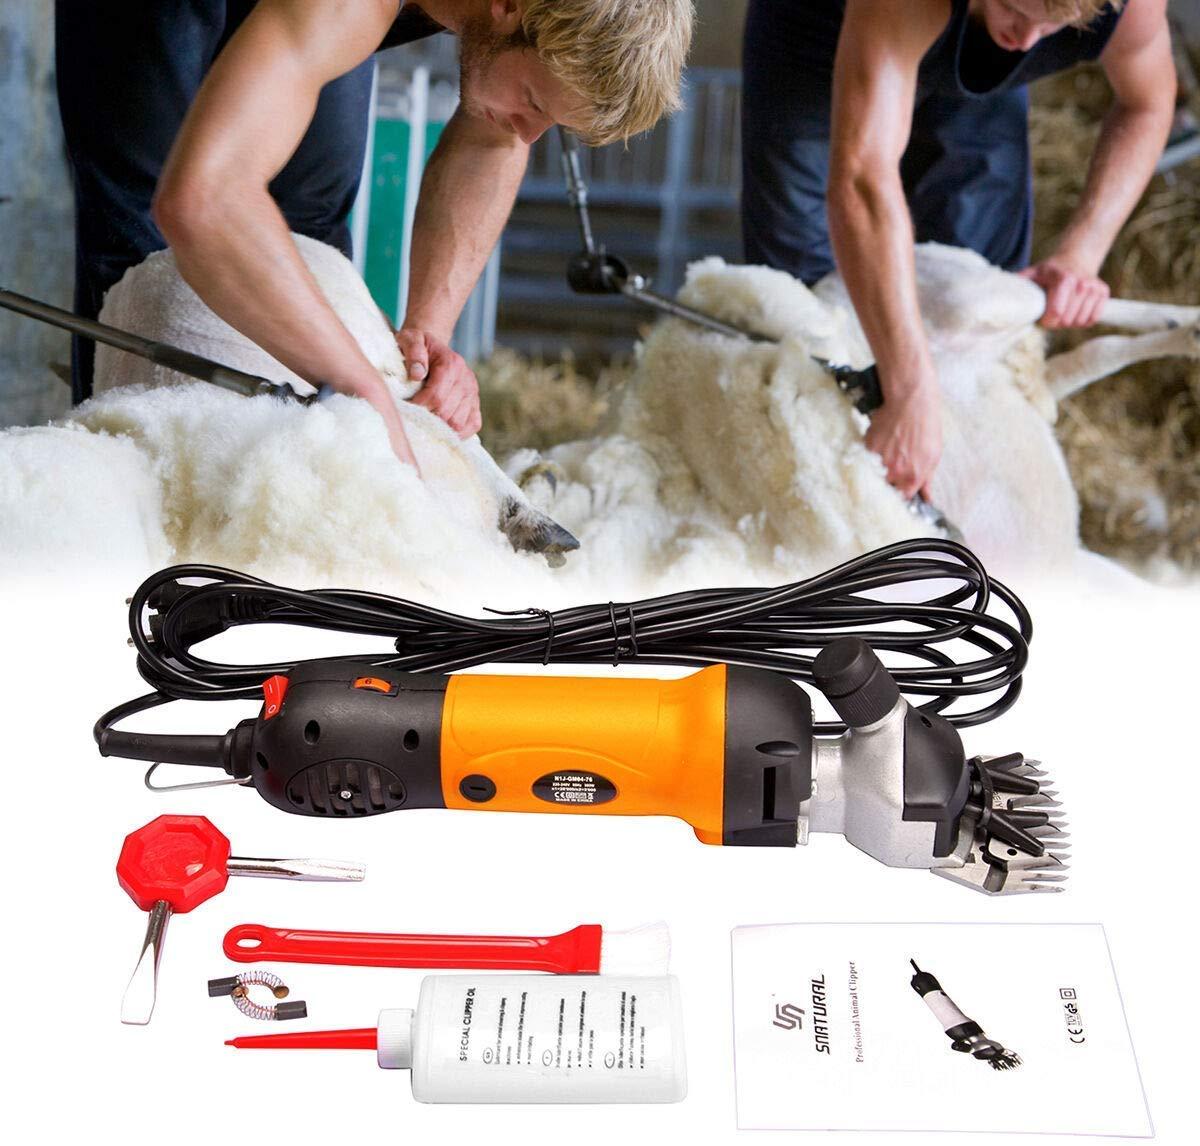 Ridgeyard 380W Electric Farm Supplies Animal Grooming Shearing Clipper Sheep Goat Shears Electric Clippers, Farm Supplier (380w) by Ridgeyard